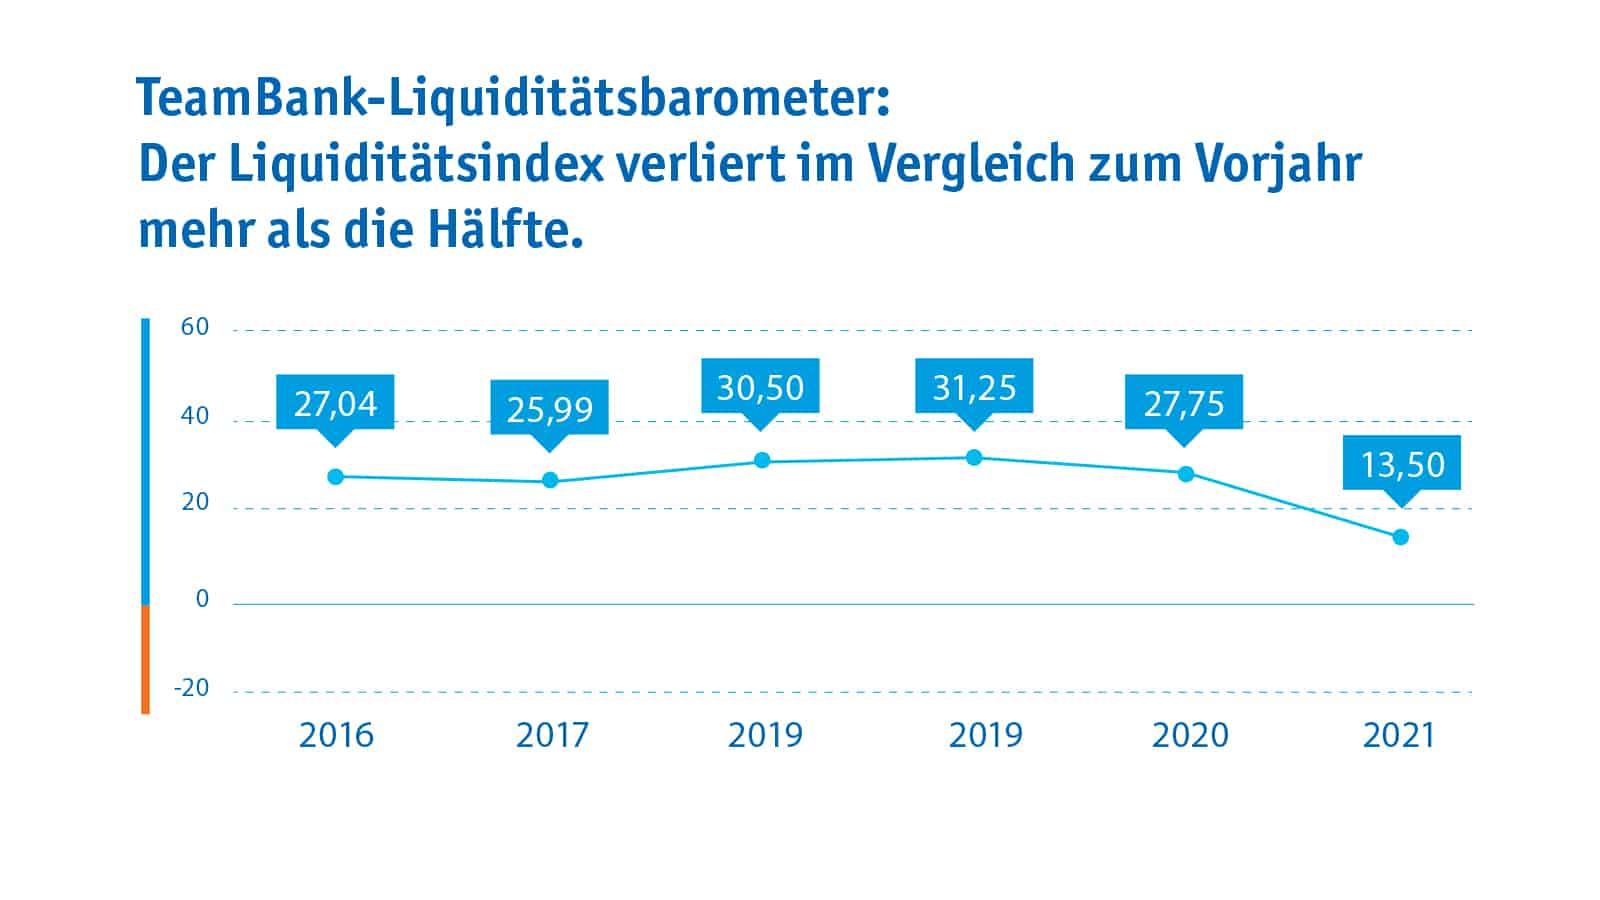 TeamBank Liquiditätsbarometer 2021